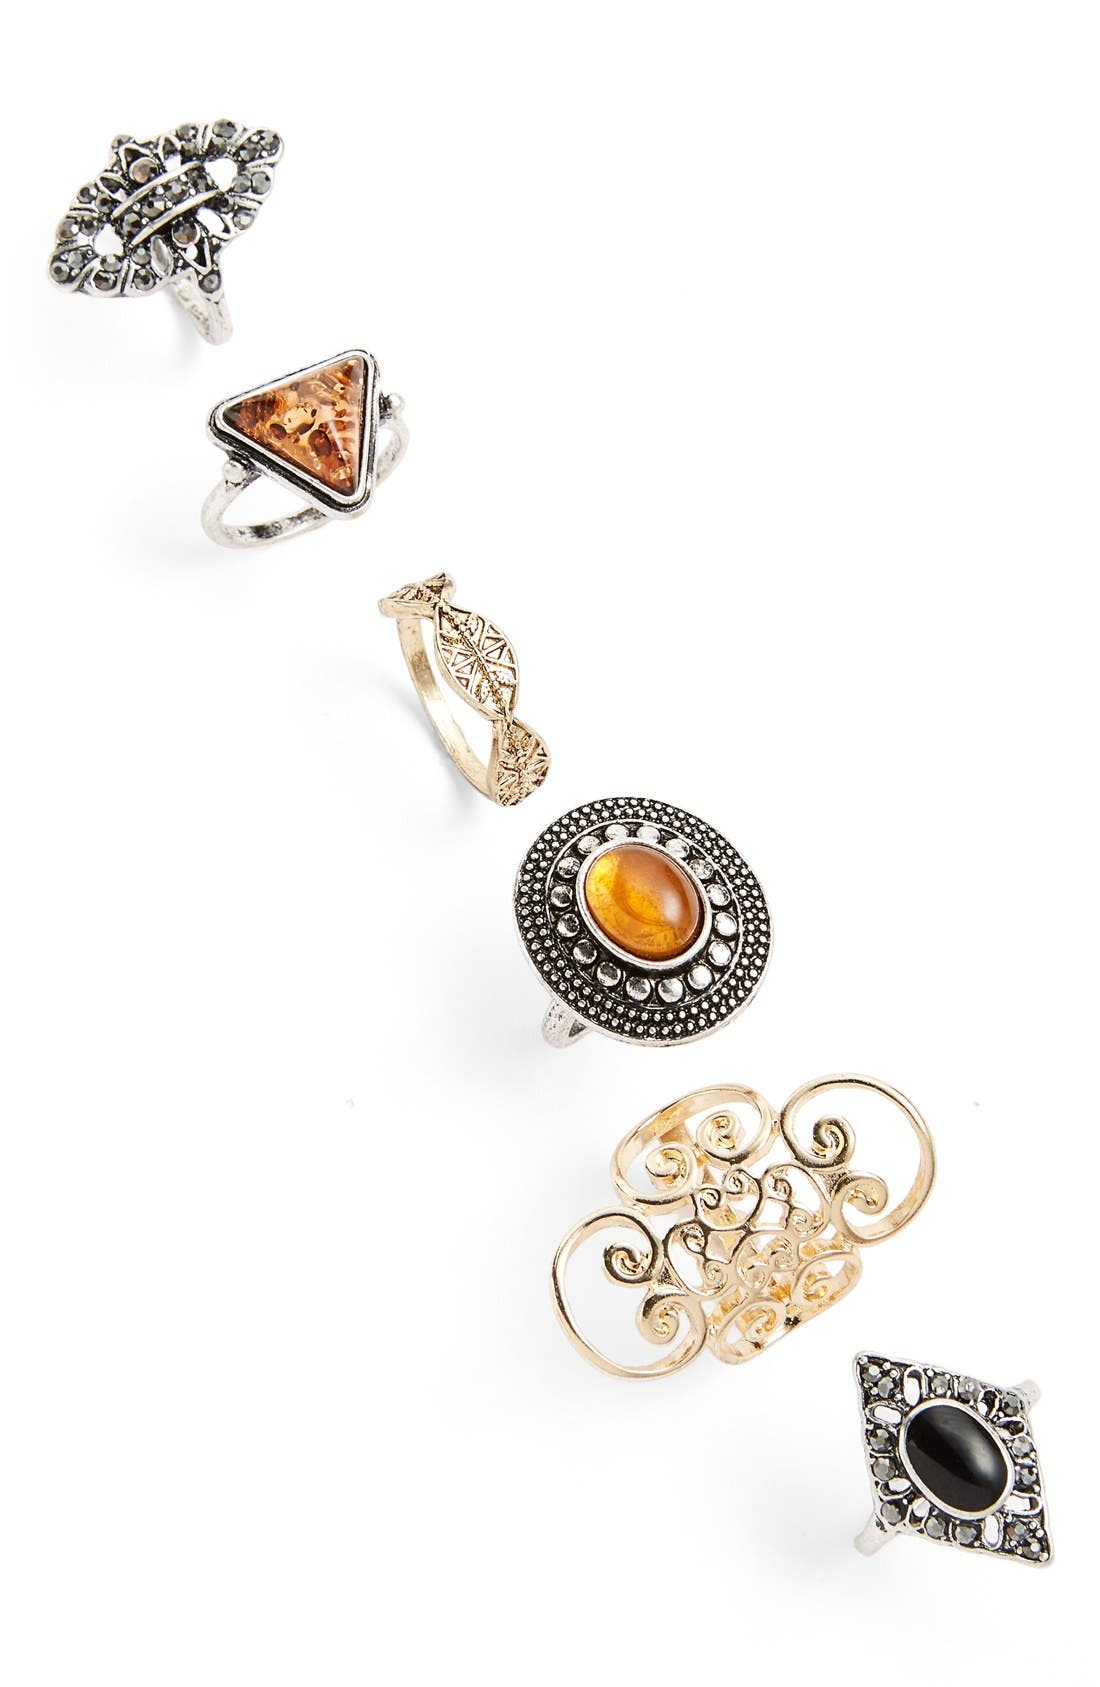 Alternate Image 1 Selected - Topshop 'Amber Look' Rings (Set of 6)